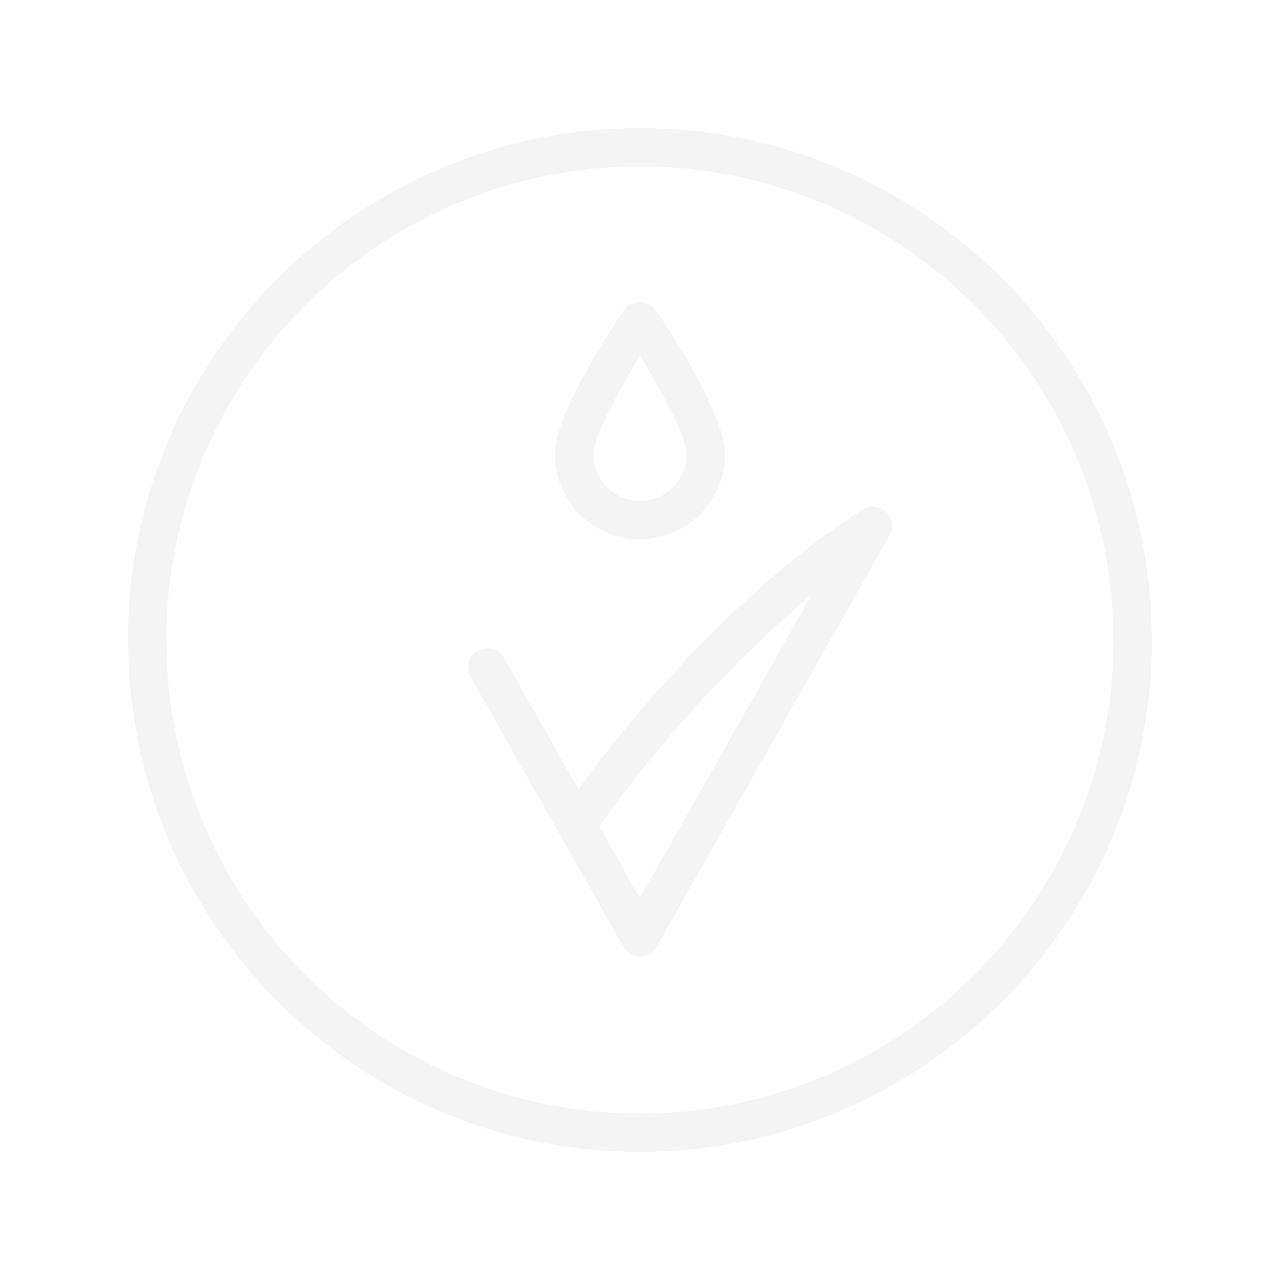 MIZON Joyful Time Essence Strawberry Mask 23g